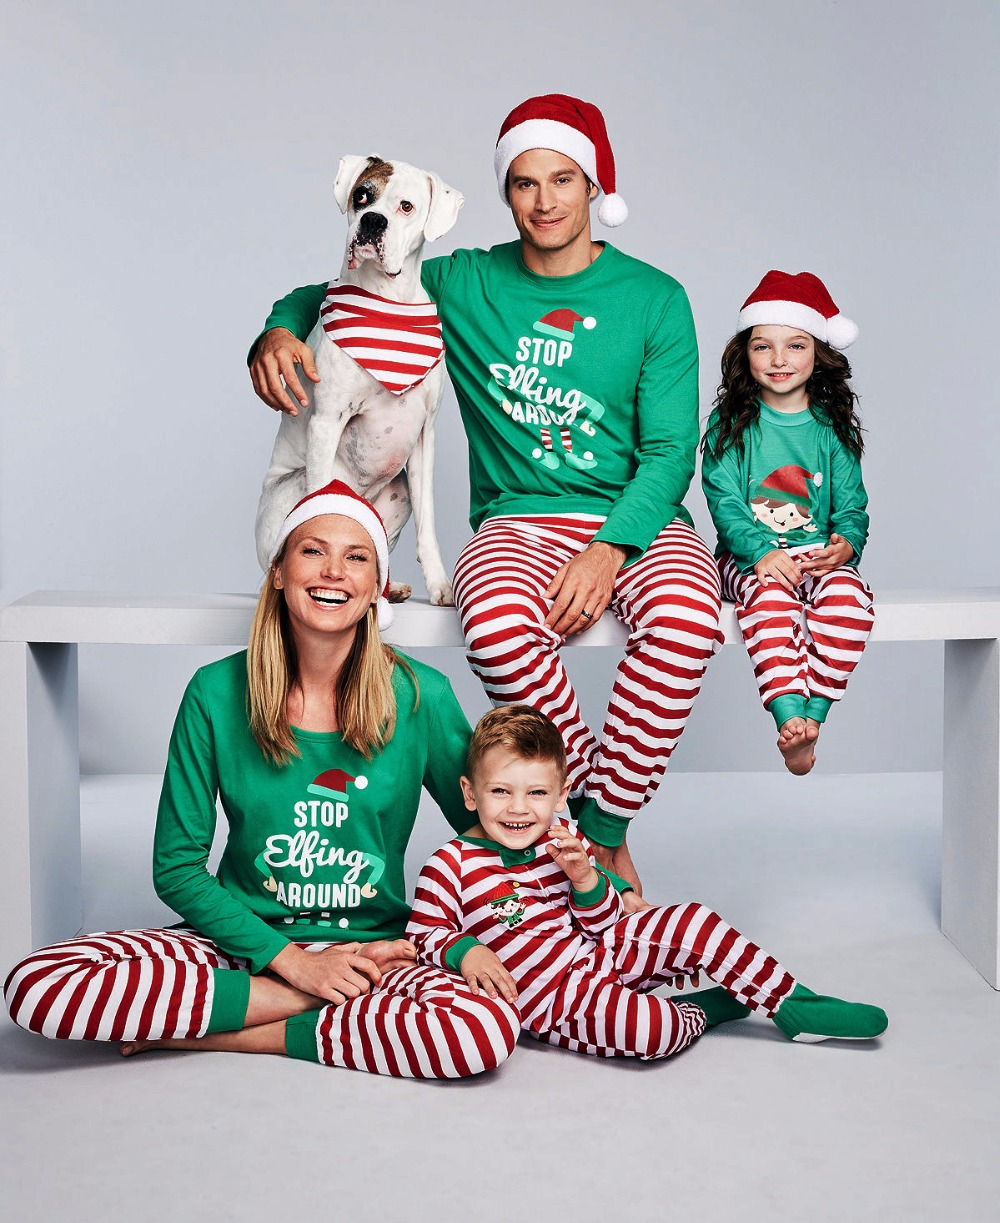 Family Christmas Pajamas Set Family Matching Clothes Adult Kids Pajamas Set Baby Romper Xmas STOP Elfing Family Sleepwear